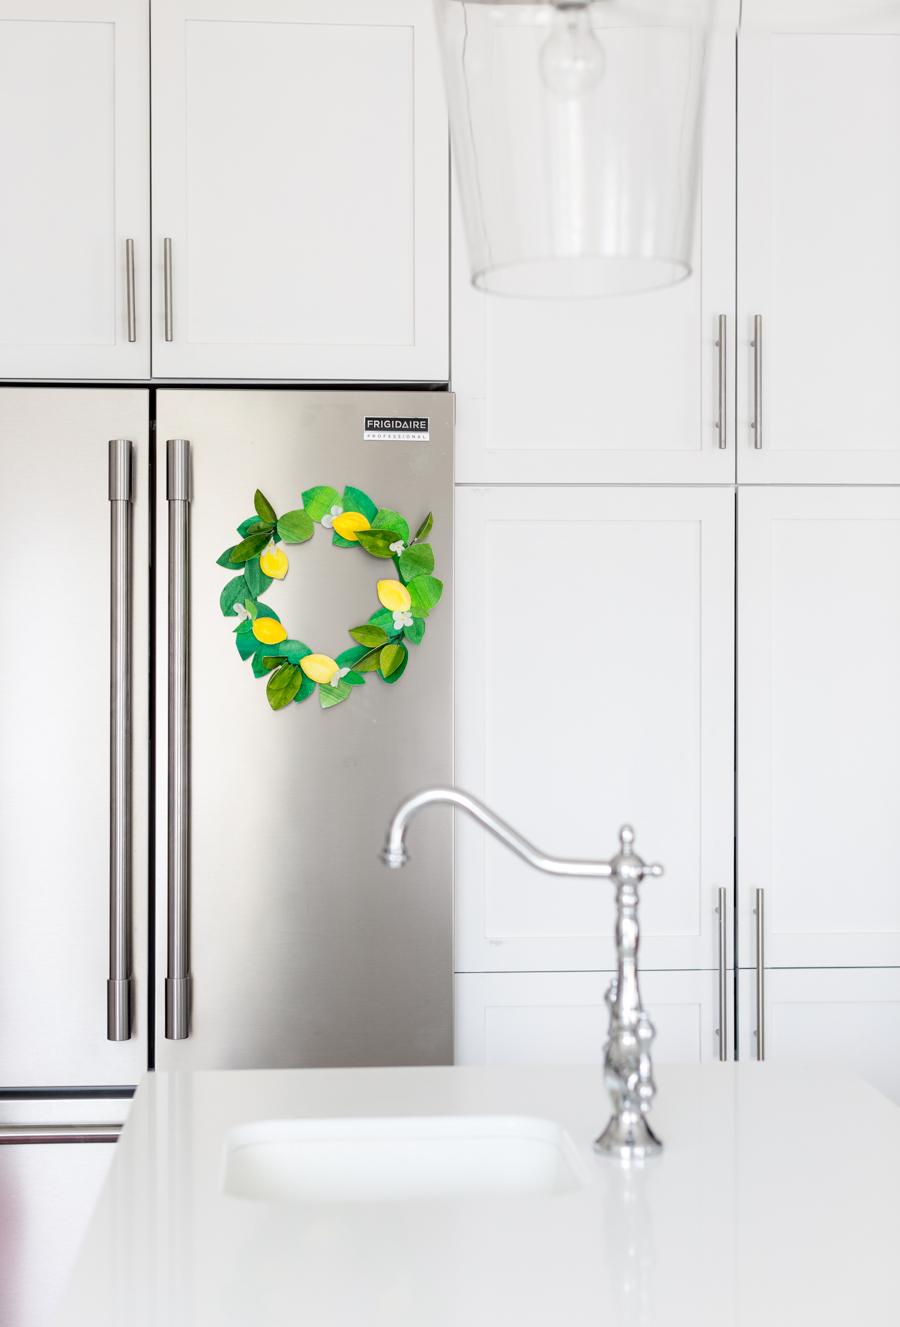 paper lemon wreath diy craftberrybush-27